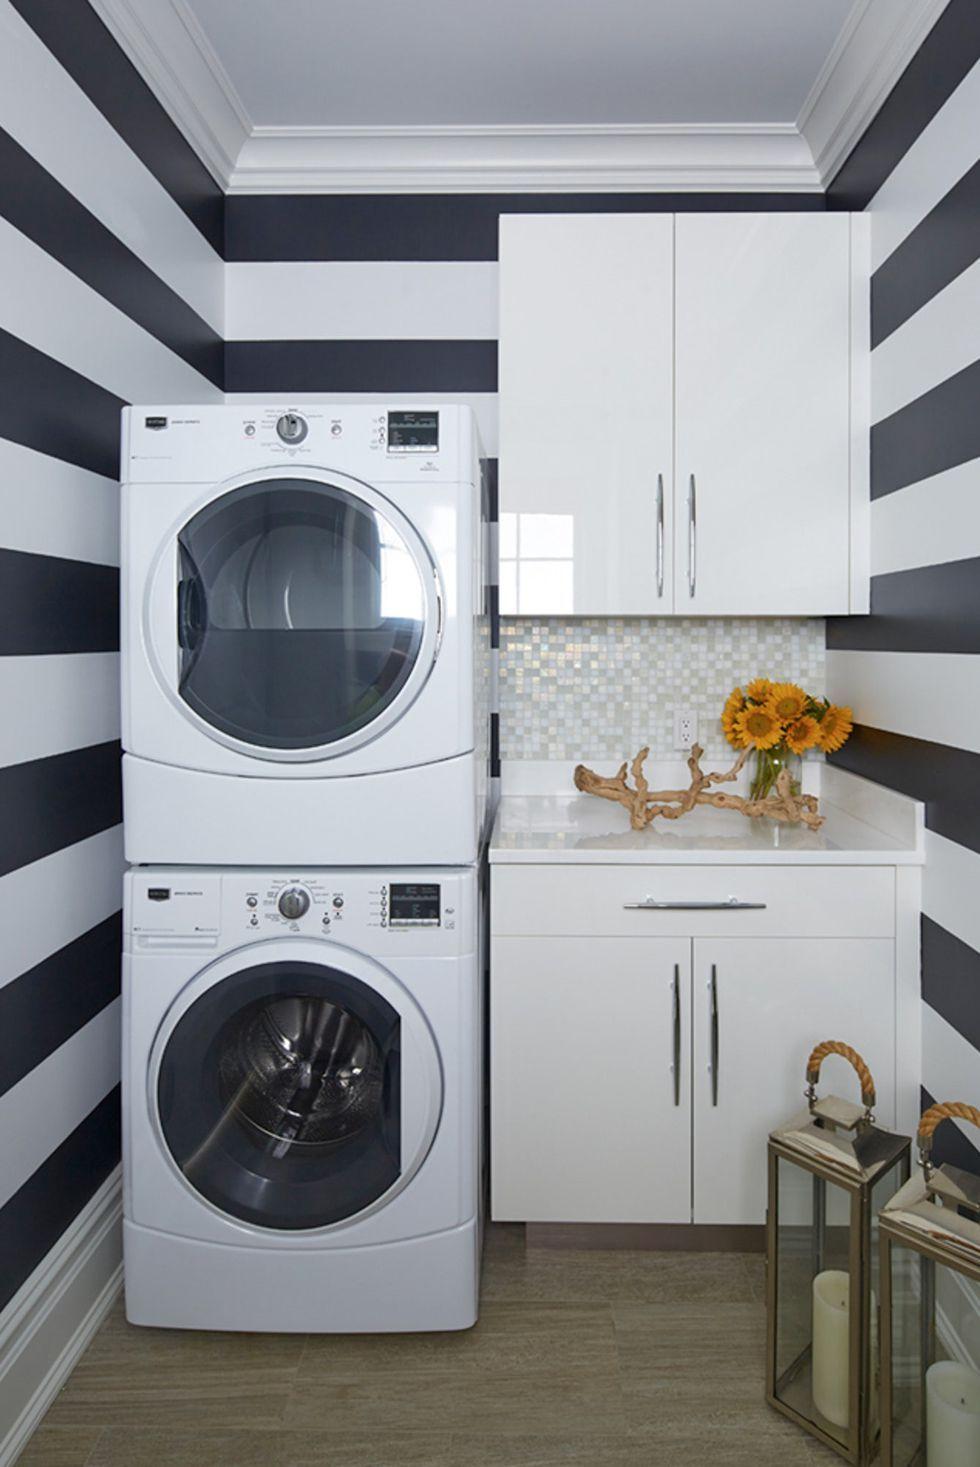 15 Brilliant Design Ideas For Small Laundry Rooms Small Laundry Rooms White Laundry Rooms Small Laundry